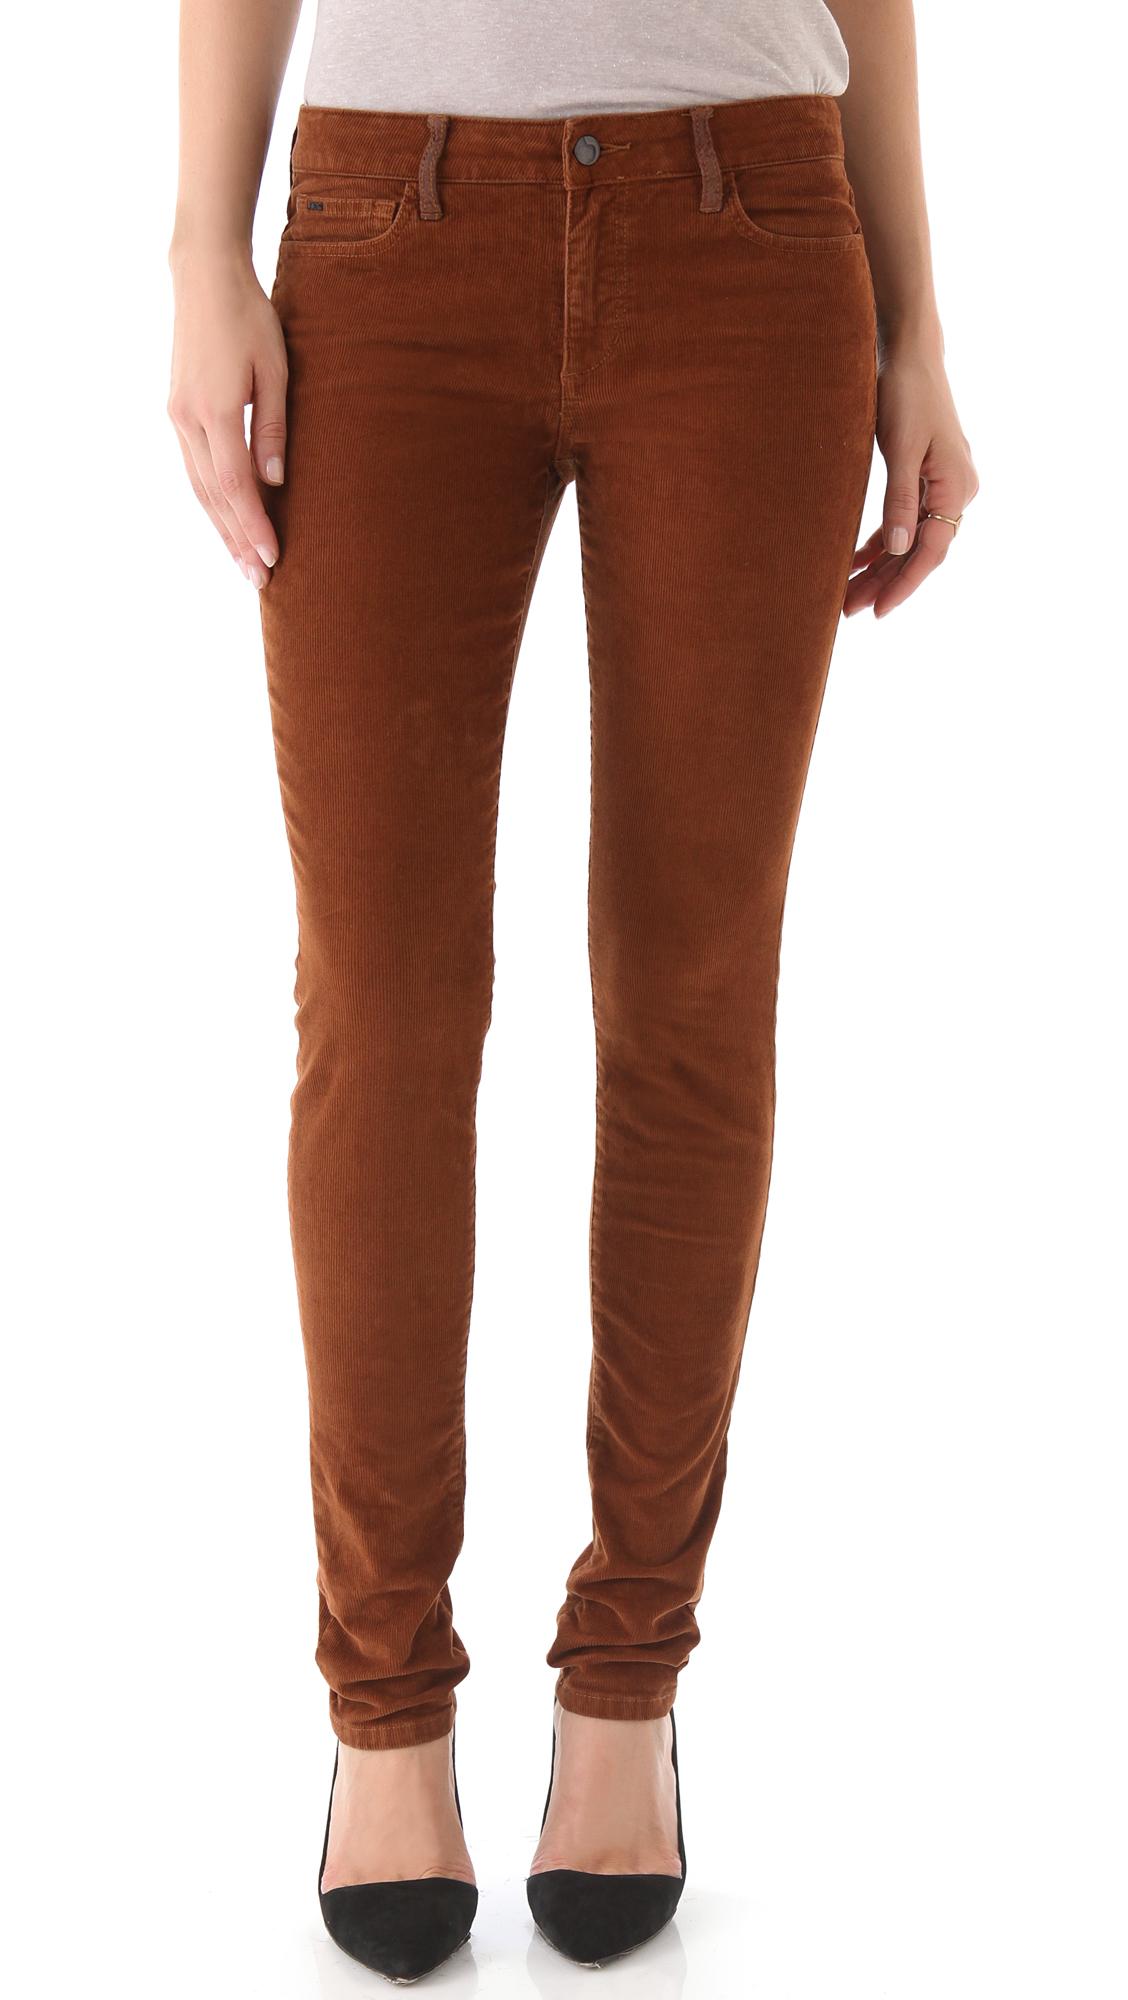 Creative CurrentElliott 39The Stiletto39 Crop Skinny Corduroy Pants